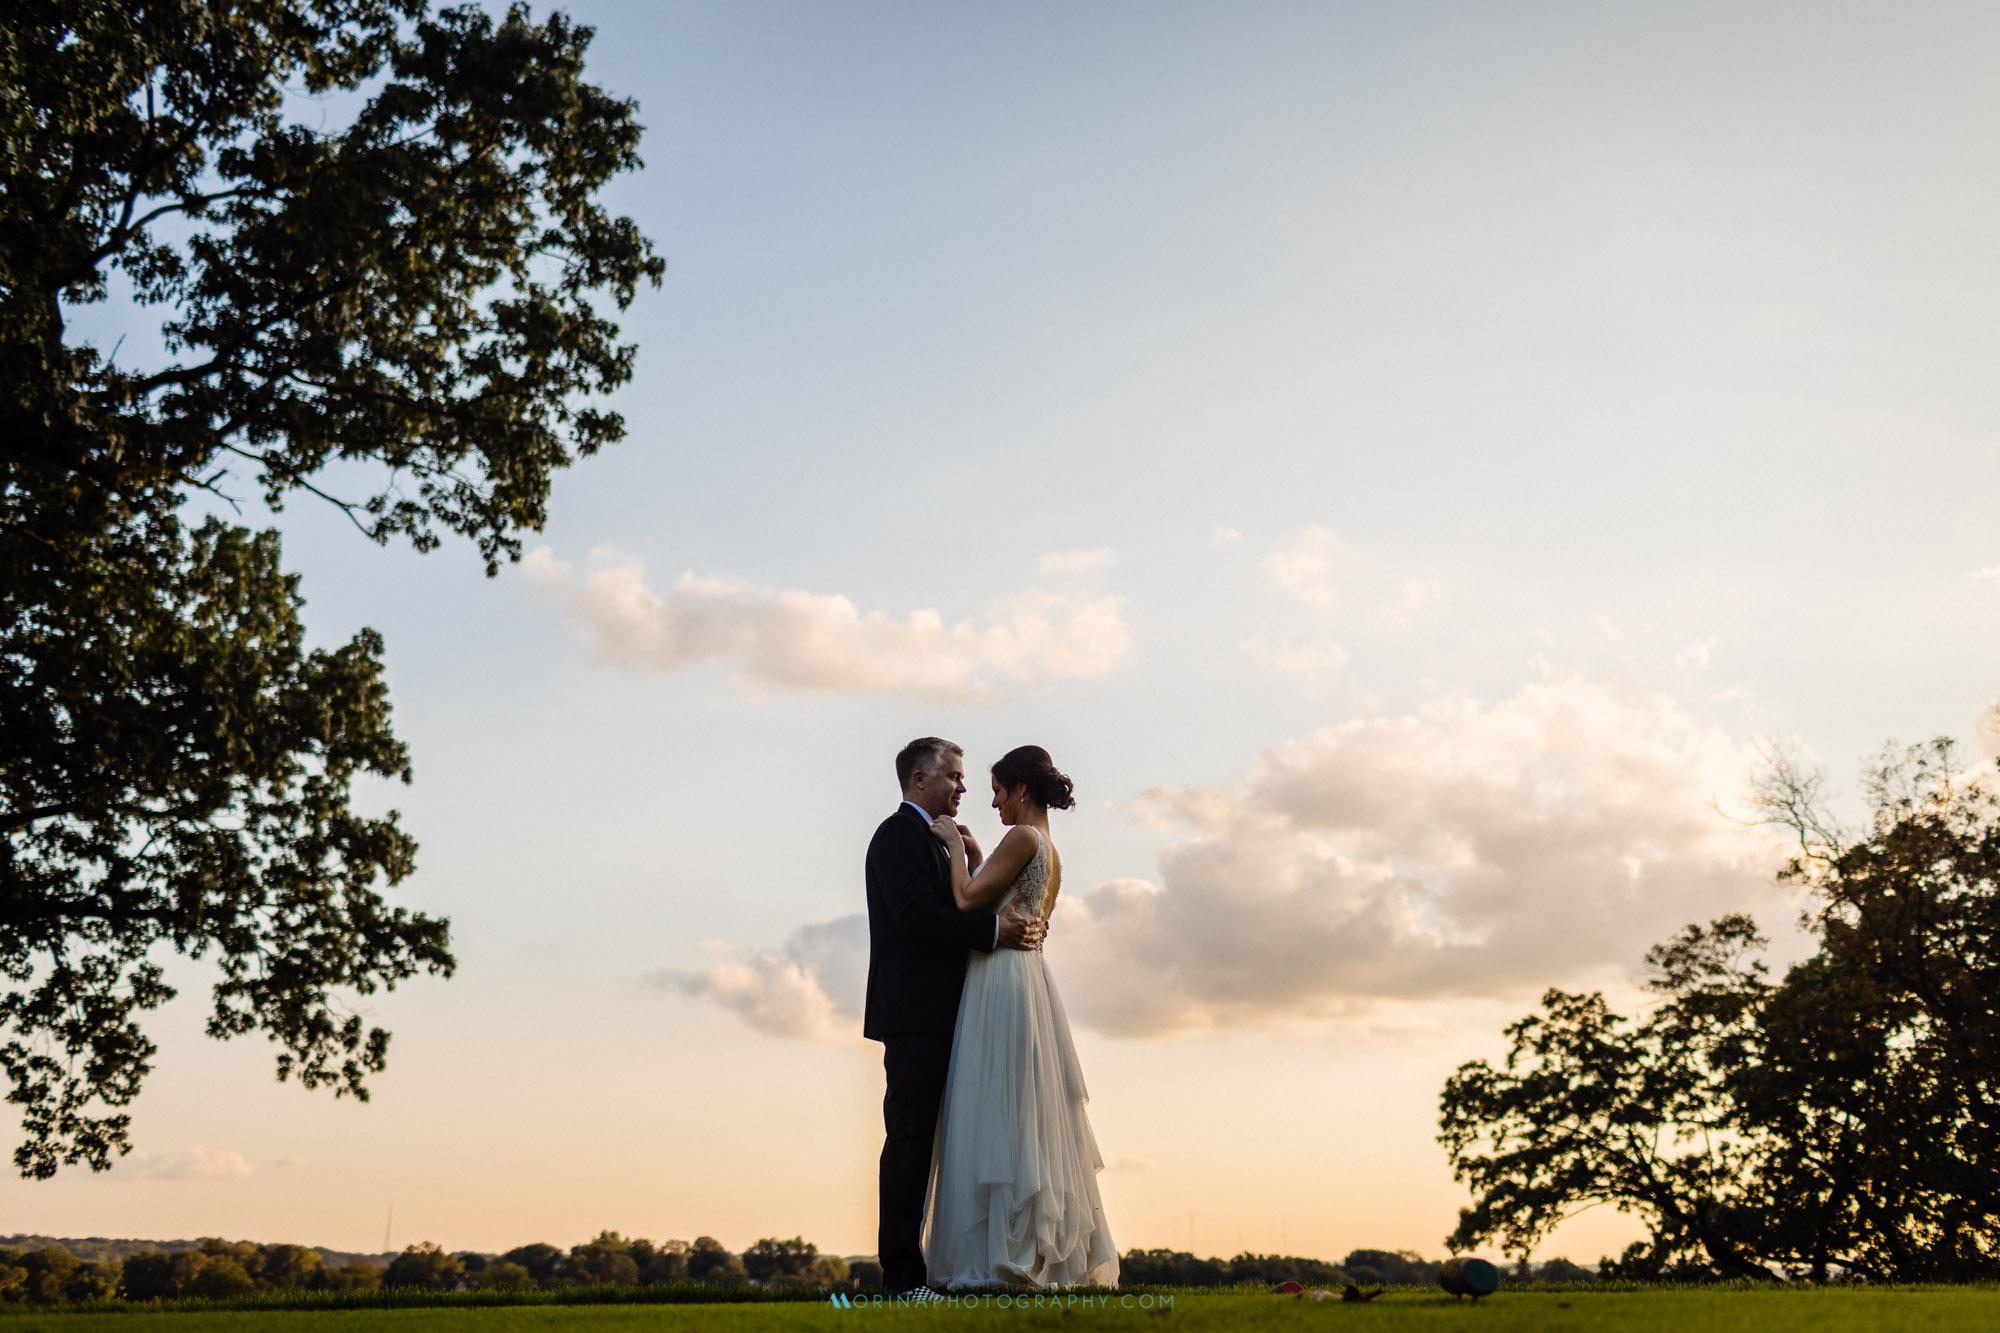 Colleen & Bill Wedding at Manufacturers' Golf & Country Club wedding 0064.jpg